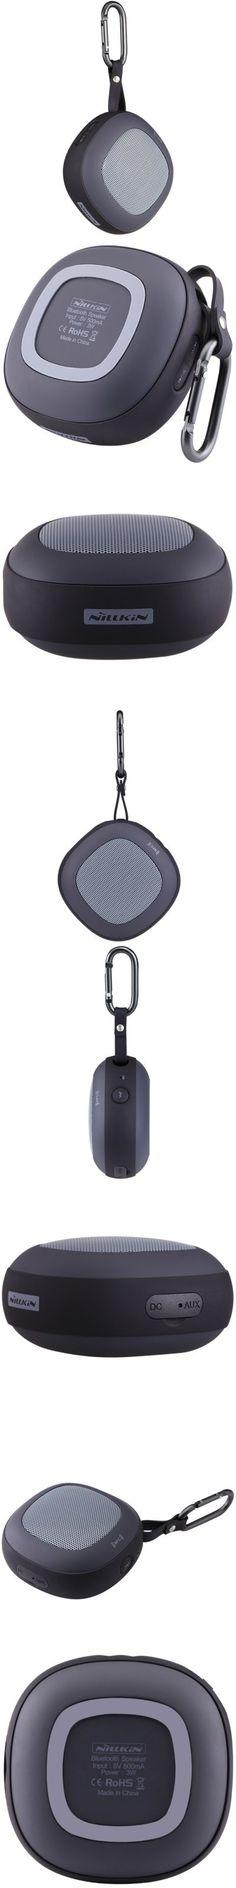 iPhone Speakers | Nillkin Mini Bluetooth Speaker